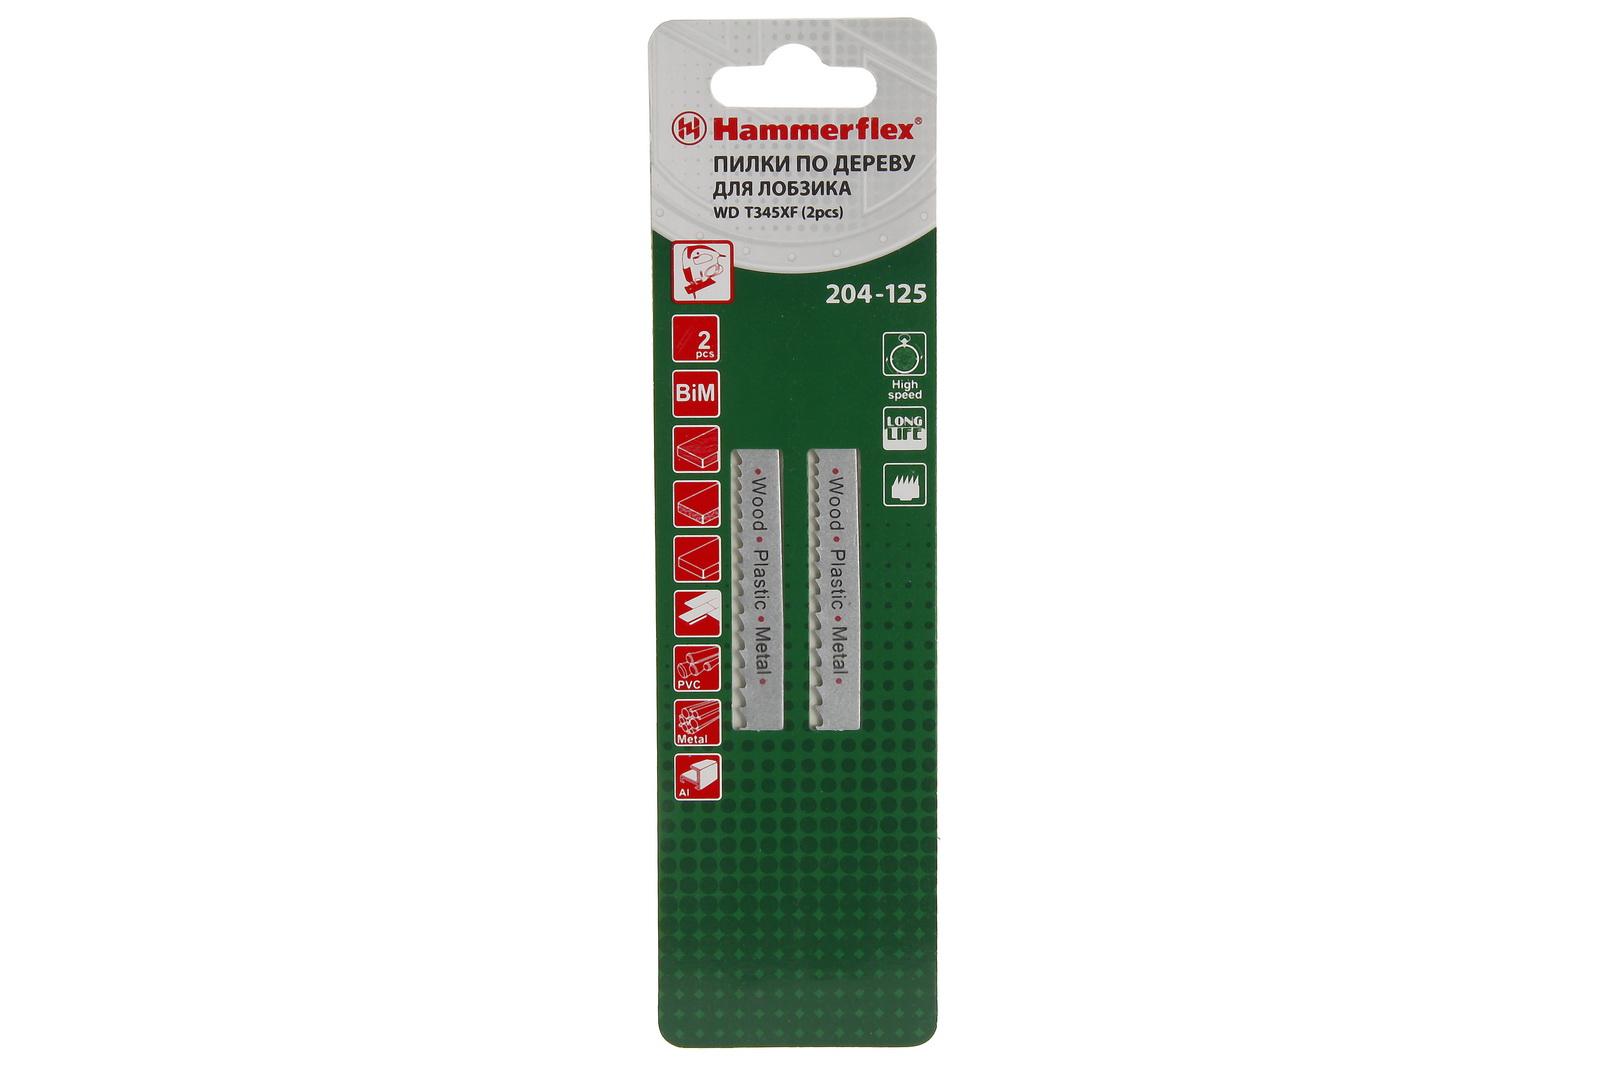 Пилки для лобзика Hammer 204-125 jg wd t345xf (2шт.) пилки для лобзика универсальные t345xf 2 шт 10 70 мм практика стандарт